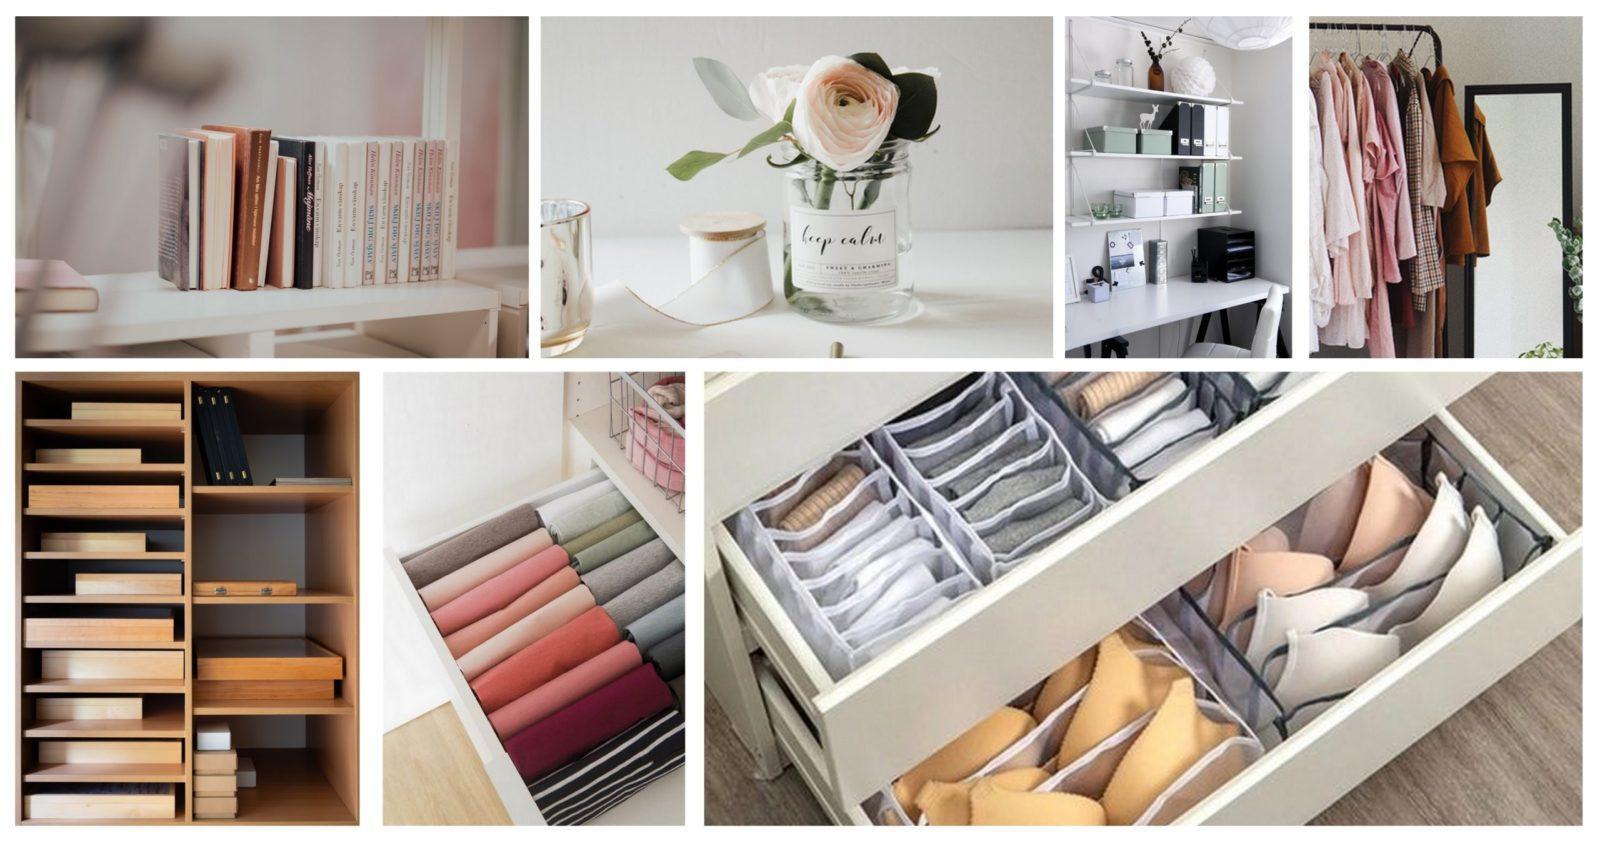 Galerie Images, Home Organiser, missions méthode KonMari